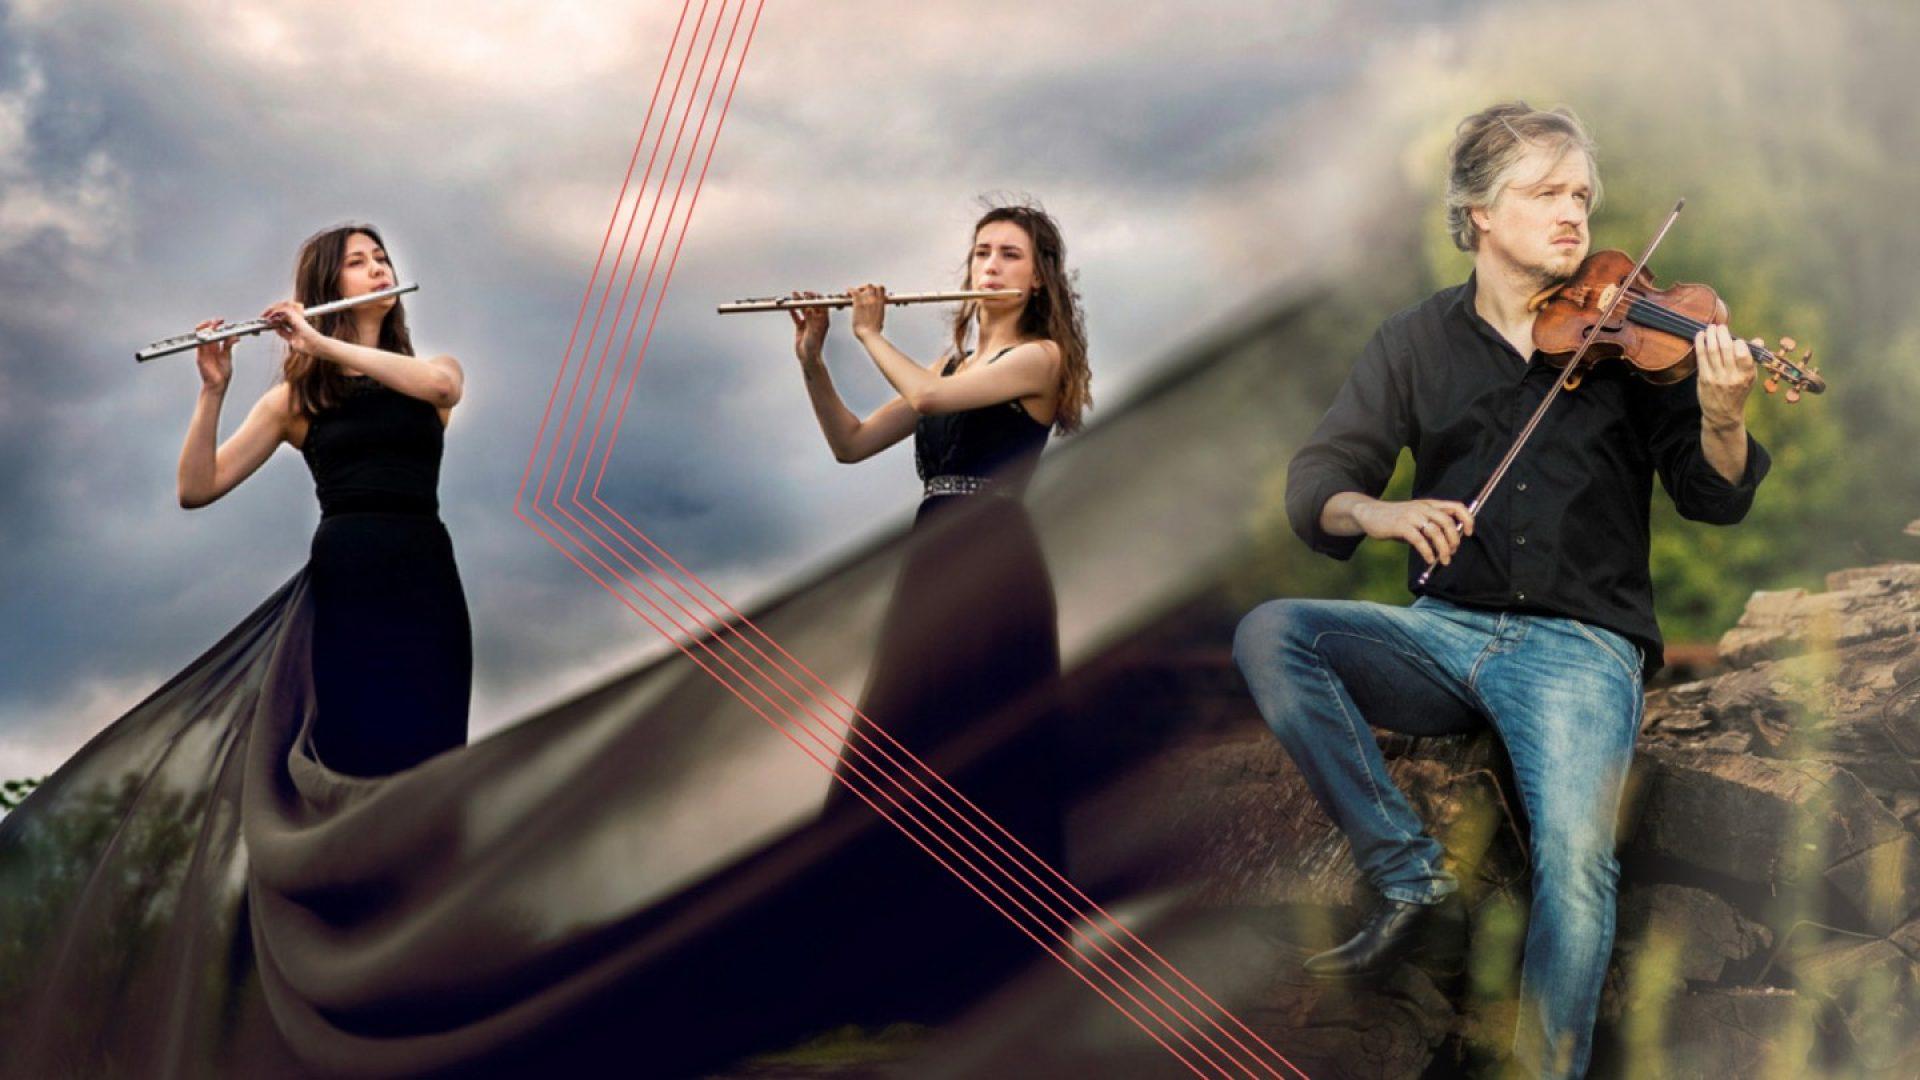 Maria Ose, Ingrid Ose og Henning Kraggerud